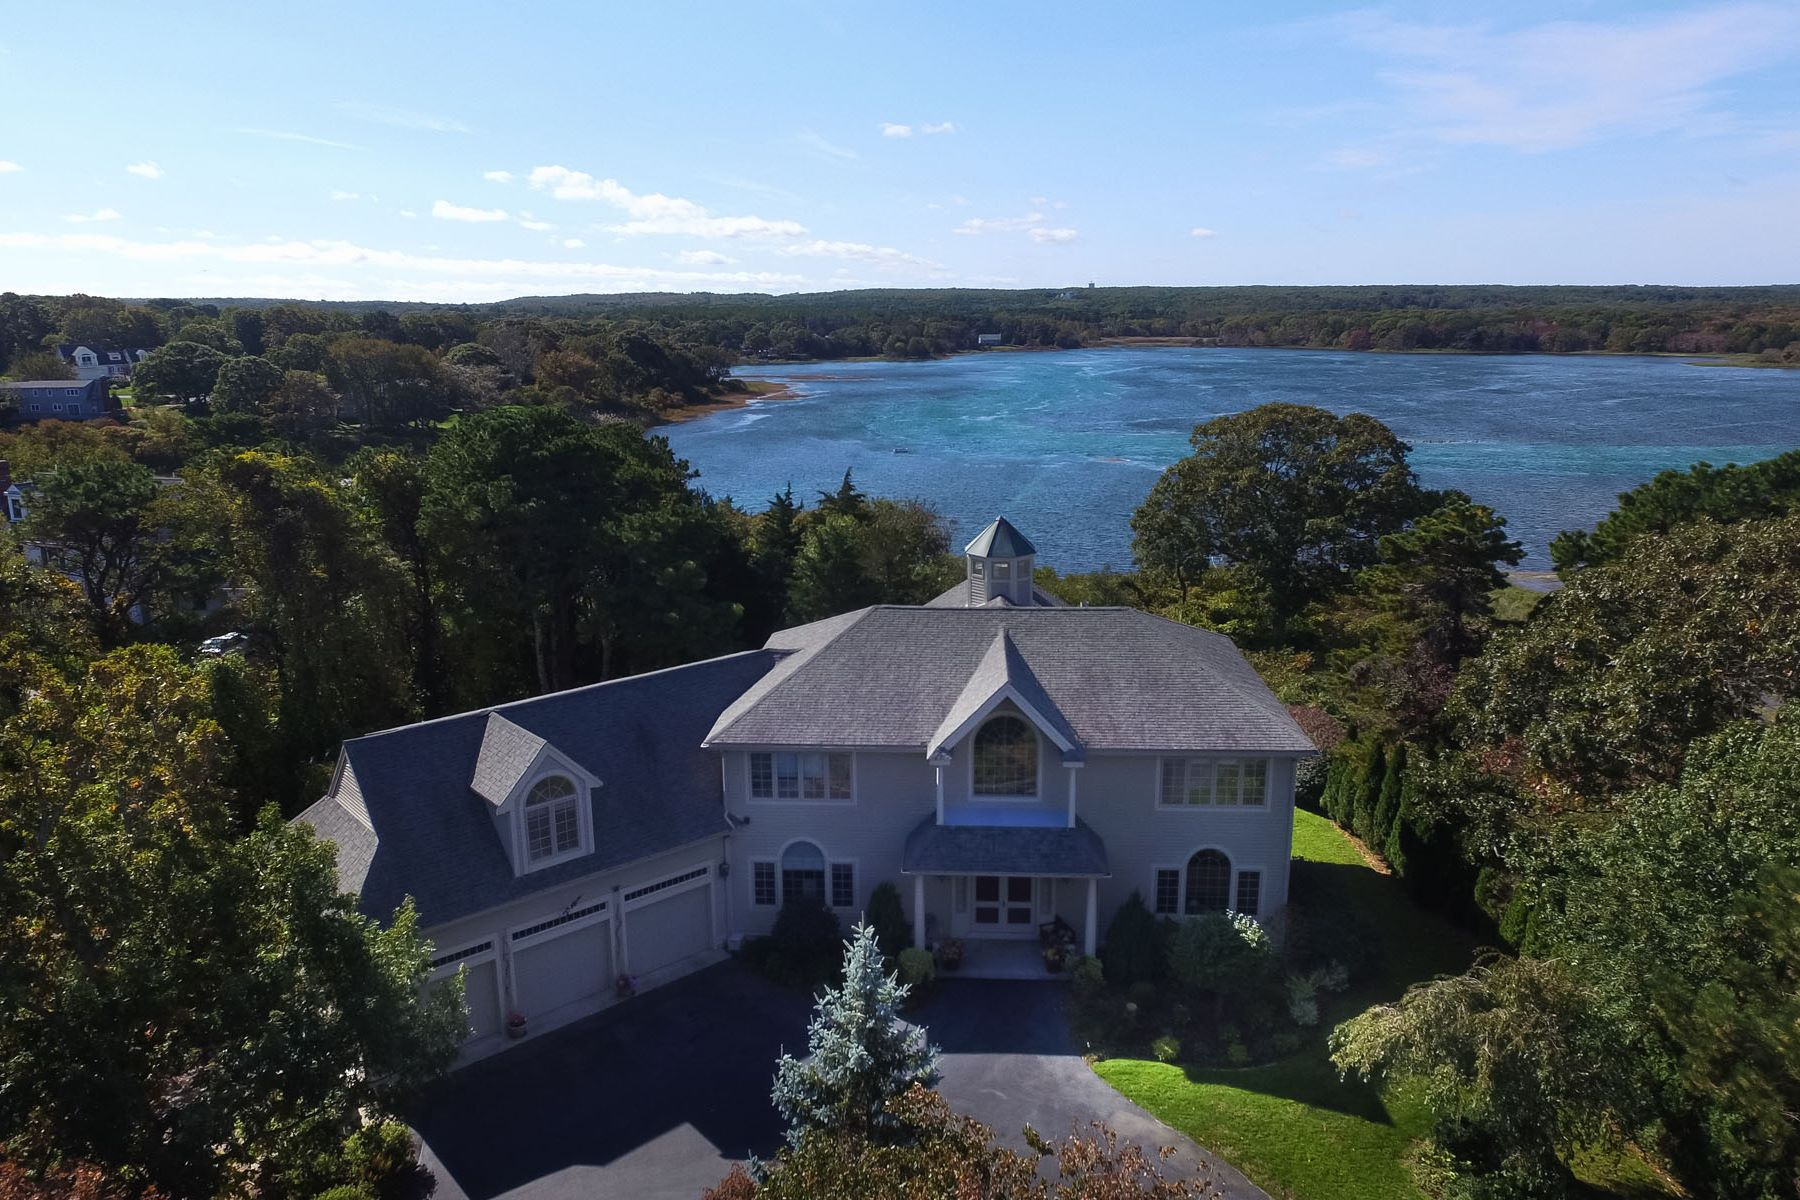 獨棟家庭住宅 為 出售 在 PALATIAL HOME OVERLOOKING SCORTON CREEK 34 Goose Point Lane East Sandwich, 麻塞諸塞州, 02537 美國